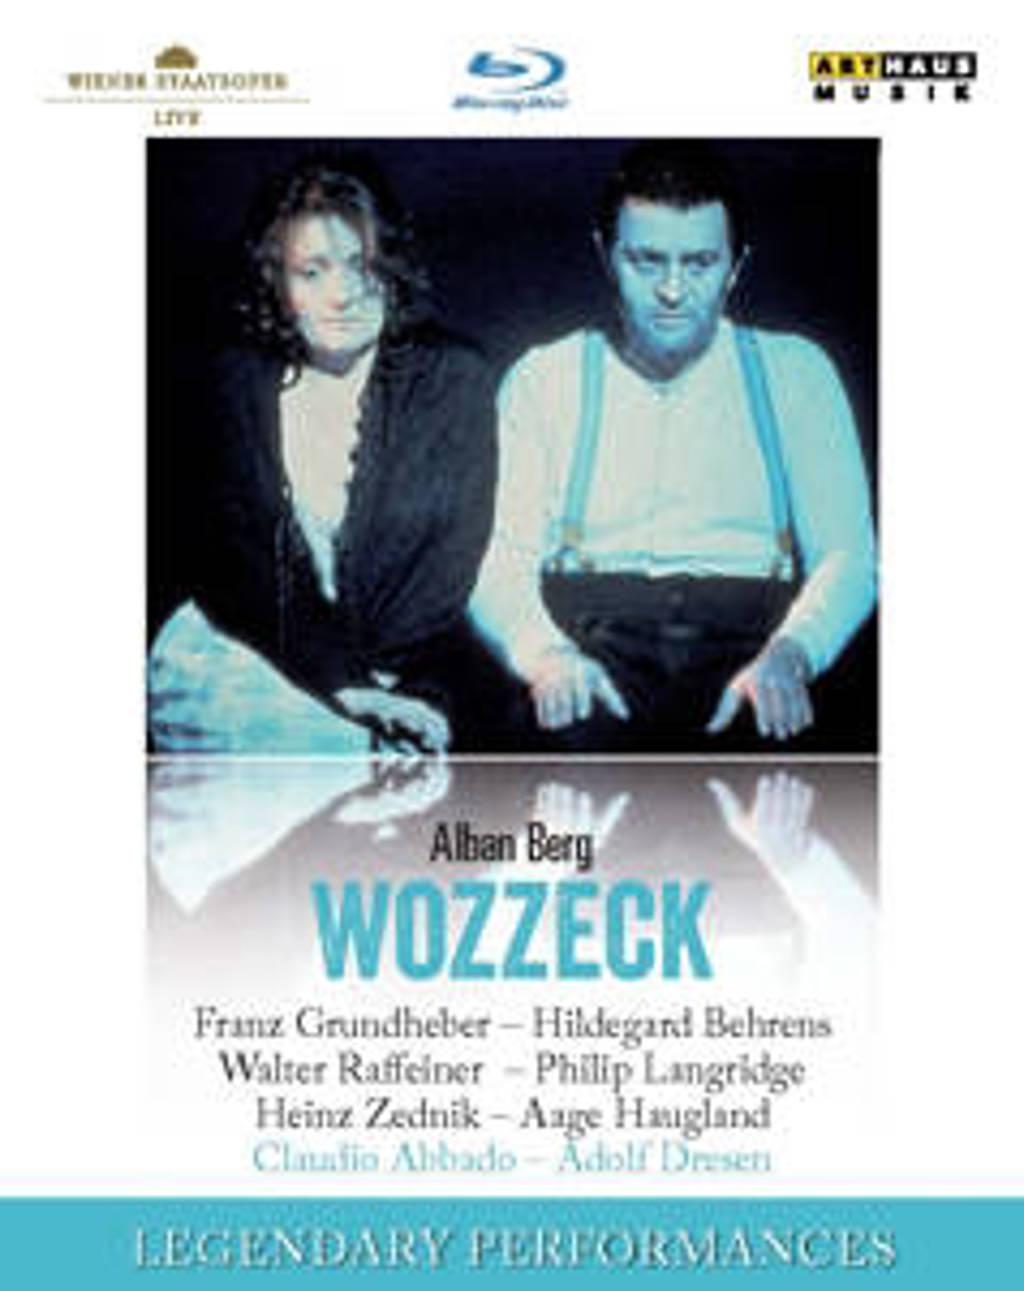 Grundheber,Raffeiner,Behrens - Legendary Performances Berg Wozzeck (Blu-ray)